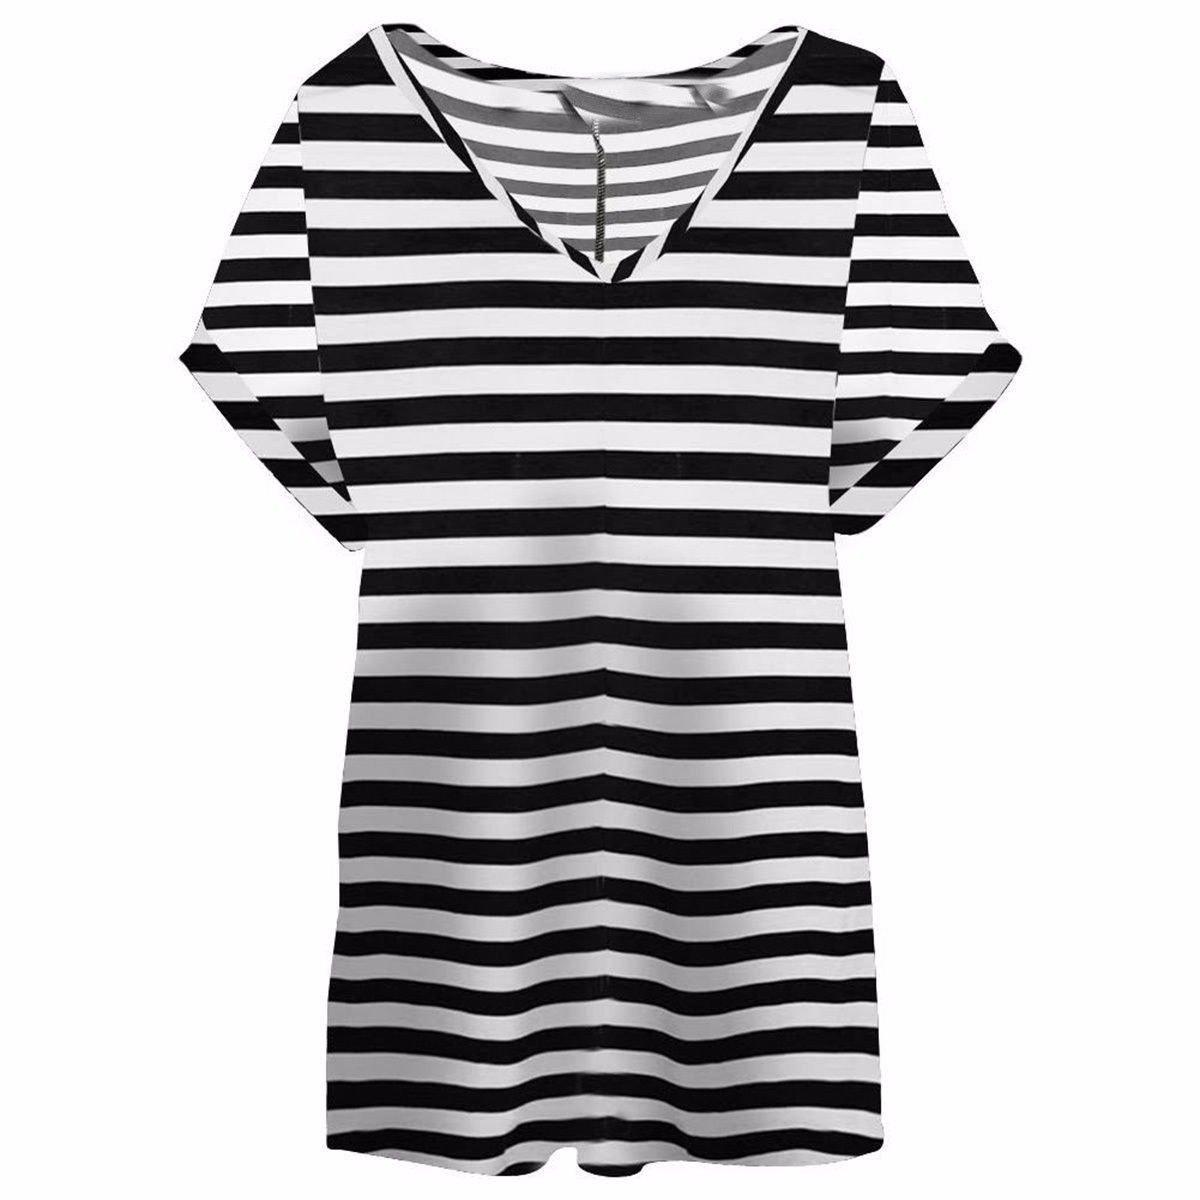 Blush Avenue® Womens Oversize Fit V Neck Top Ladies Baggy Plus Size Batwing Casual T Shirt sizes 8-24 Vneck Top Fashion1st